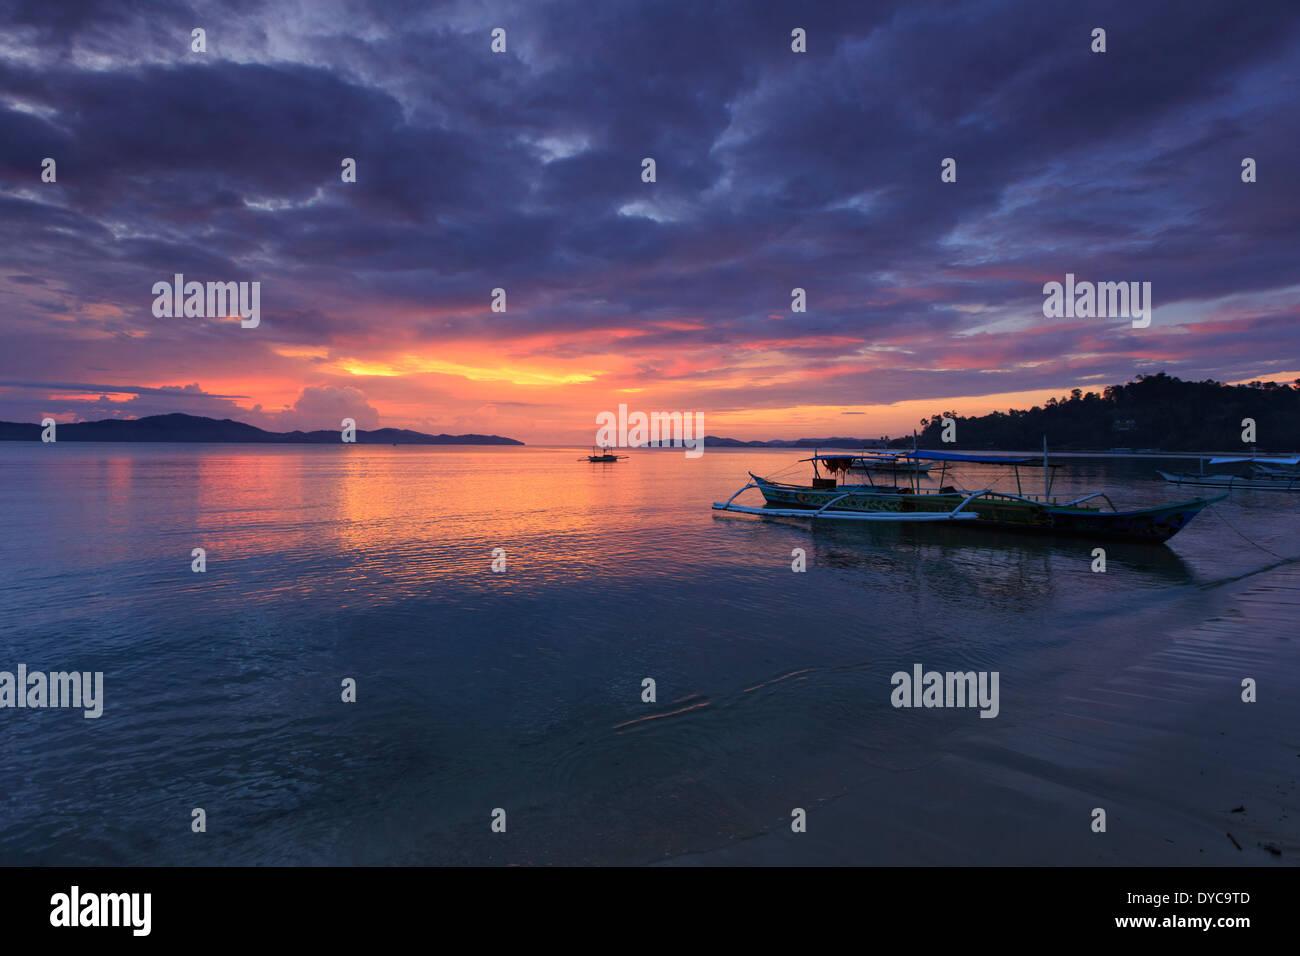 Philippines, Palawan, Port Barton - Stock Image